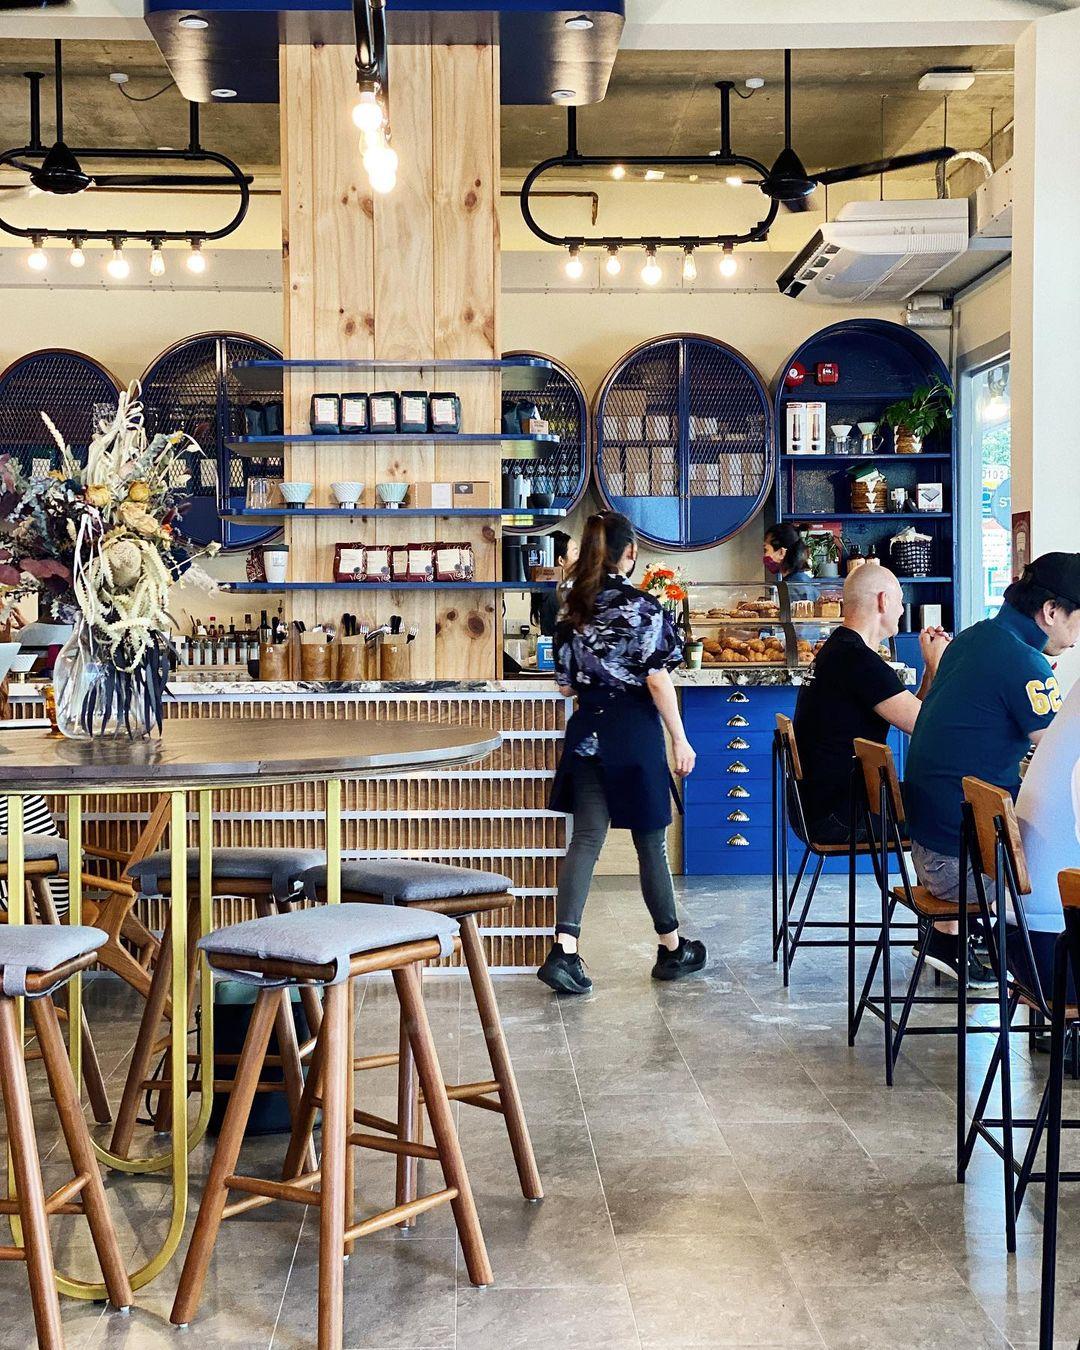 CMCR joo chiat - retail and interior